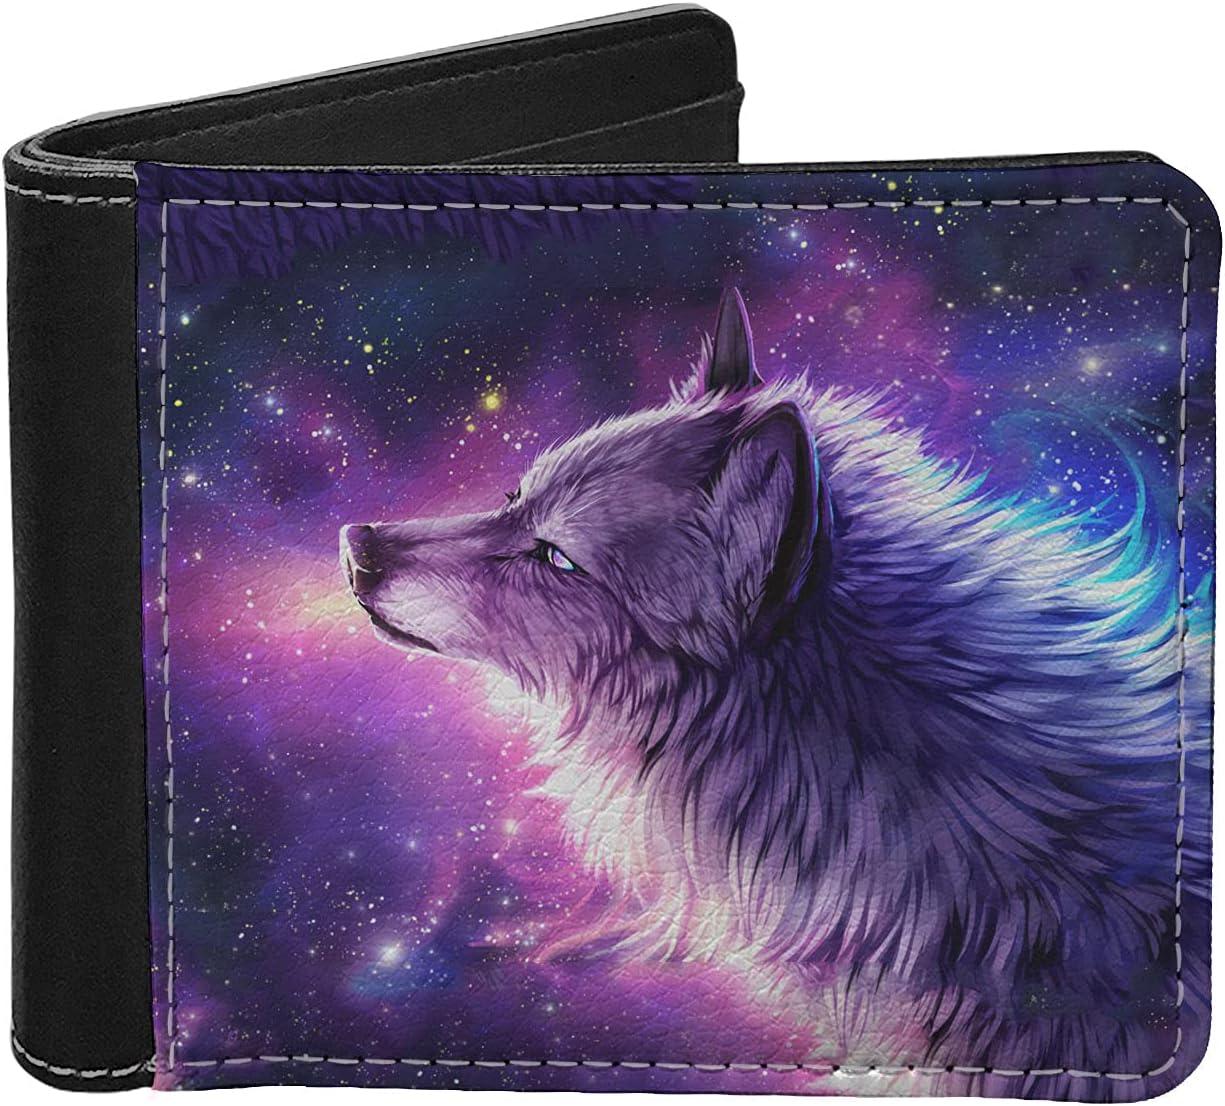 WELLFLYHOM Galaxy Wolf Leather Slim Wallet for Women Men Clutch Smart Heavy Duty Small Cards Holder Cash Organizer Foldable Clutch Coin Purse Portable Bag